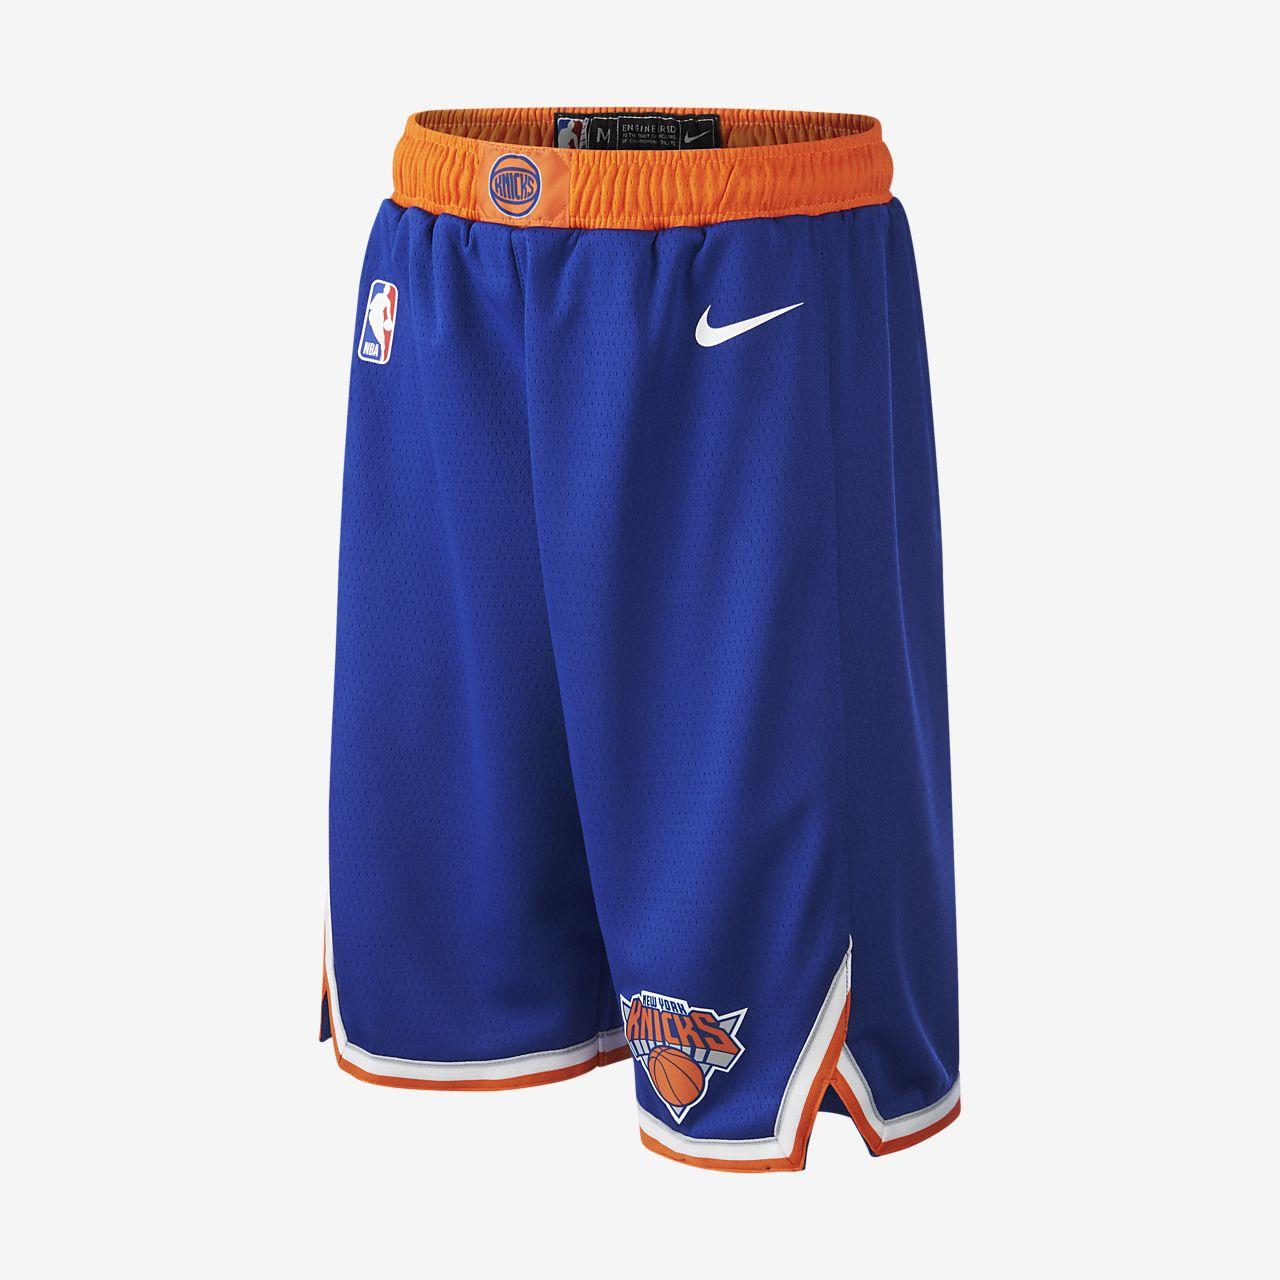 New York Knicks Icon Edition Swingman Nike NBA-Shorts für ältere Kinder